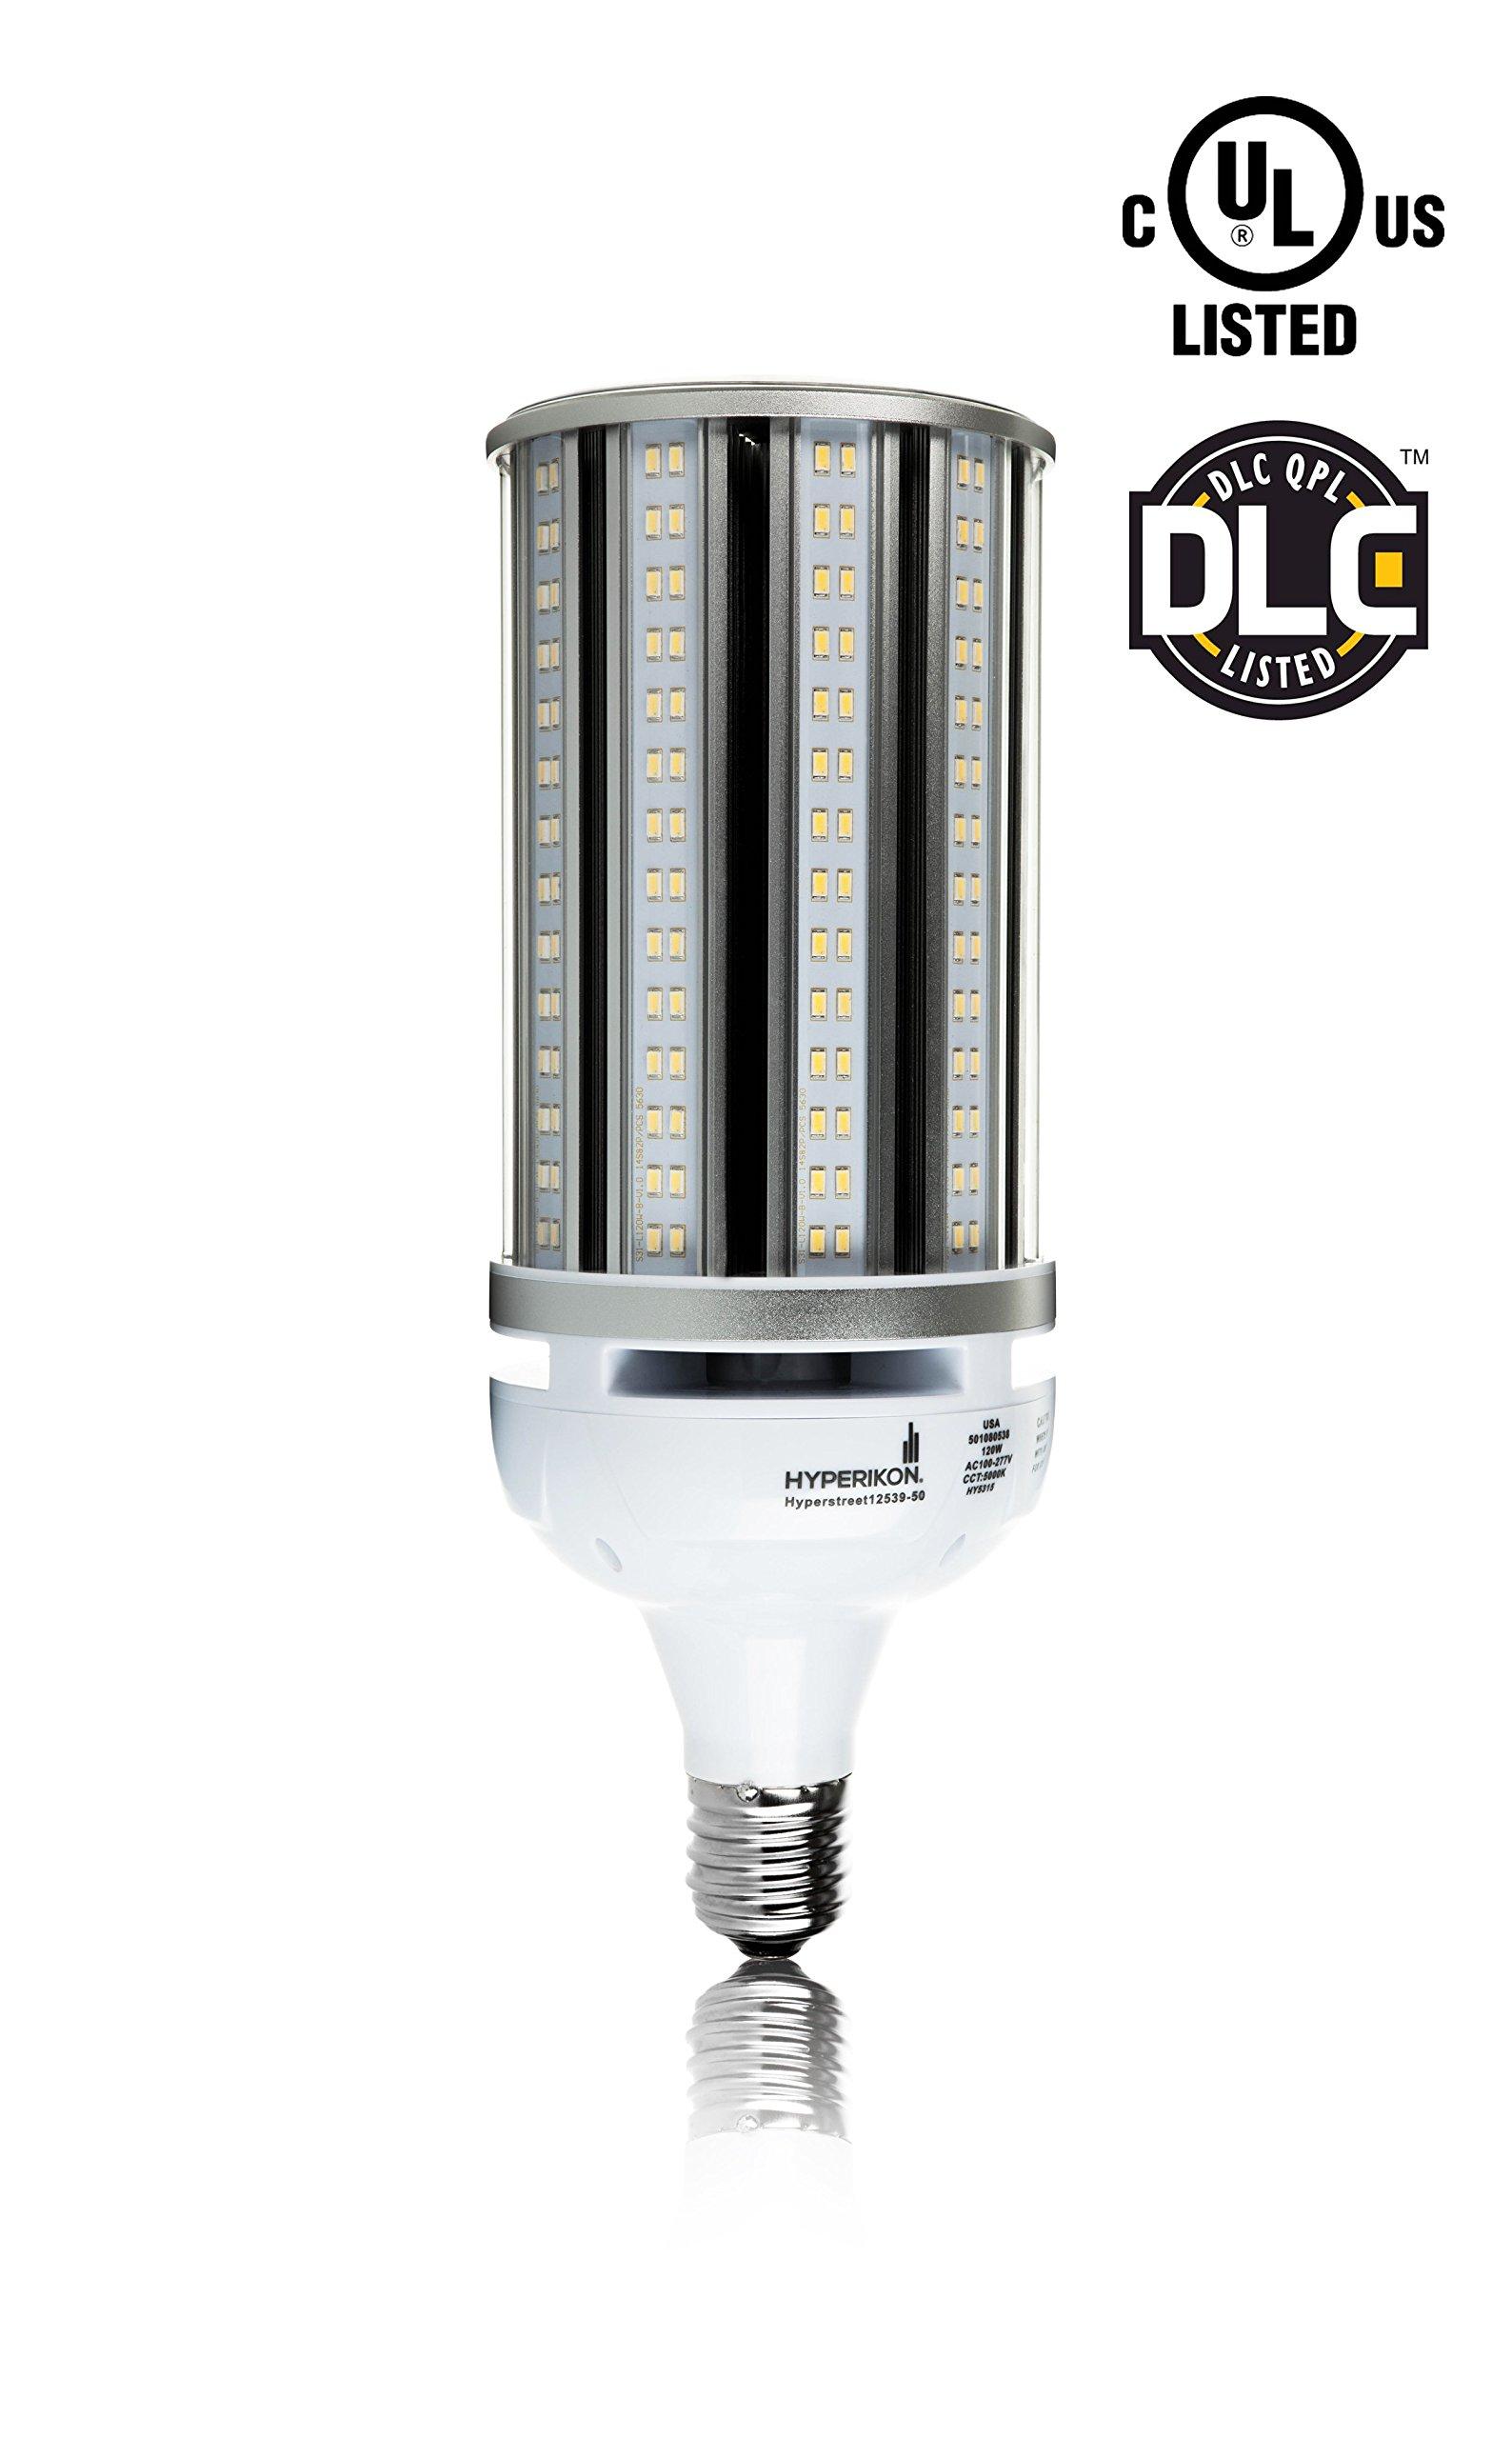 Hyperikon 125W LED Corn Bulb (750-1000 Watt Replacement), Large Mogul Screw Base (E39), 120-227v, LED Street Light, 5000K (Crystal White Glow) 360° Flood Light, Internal Driver, UL-Listed